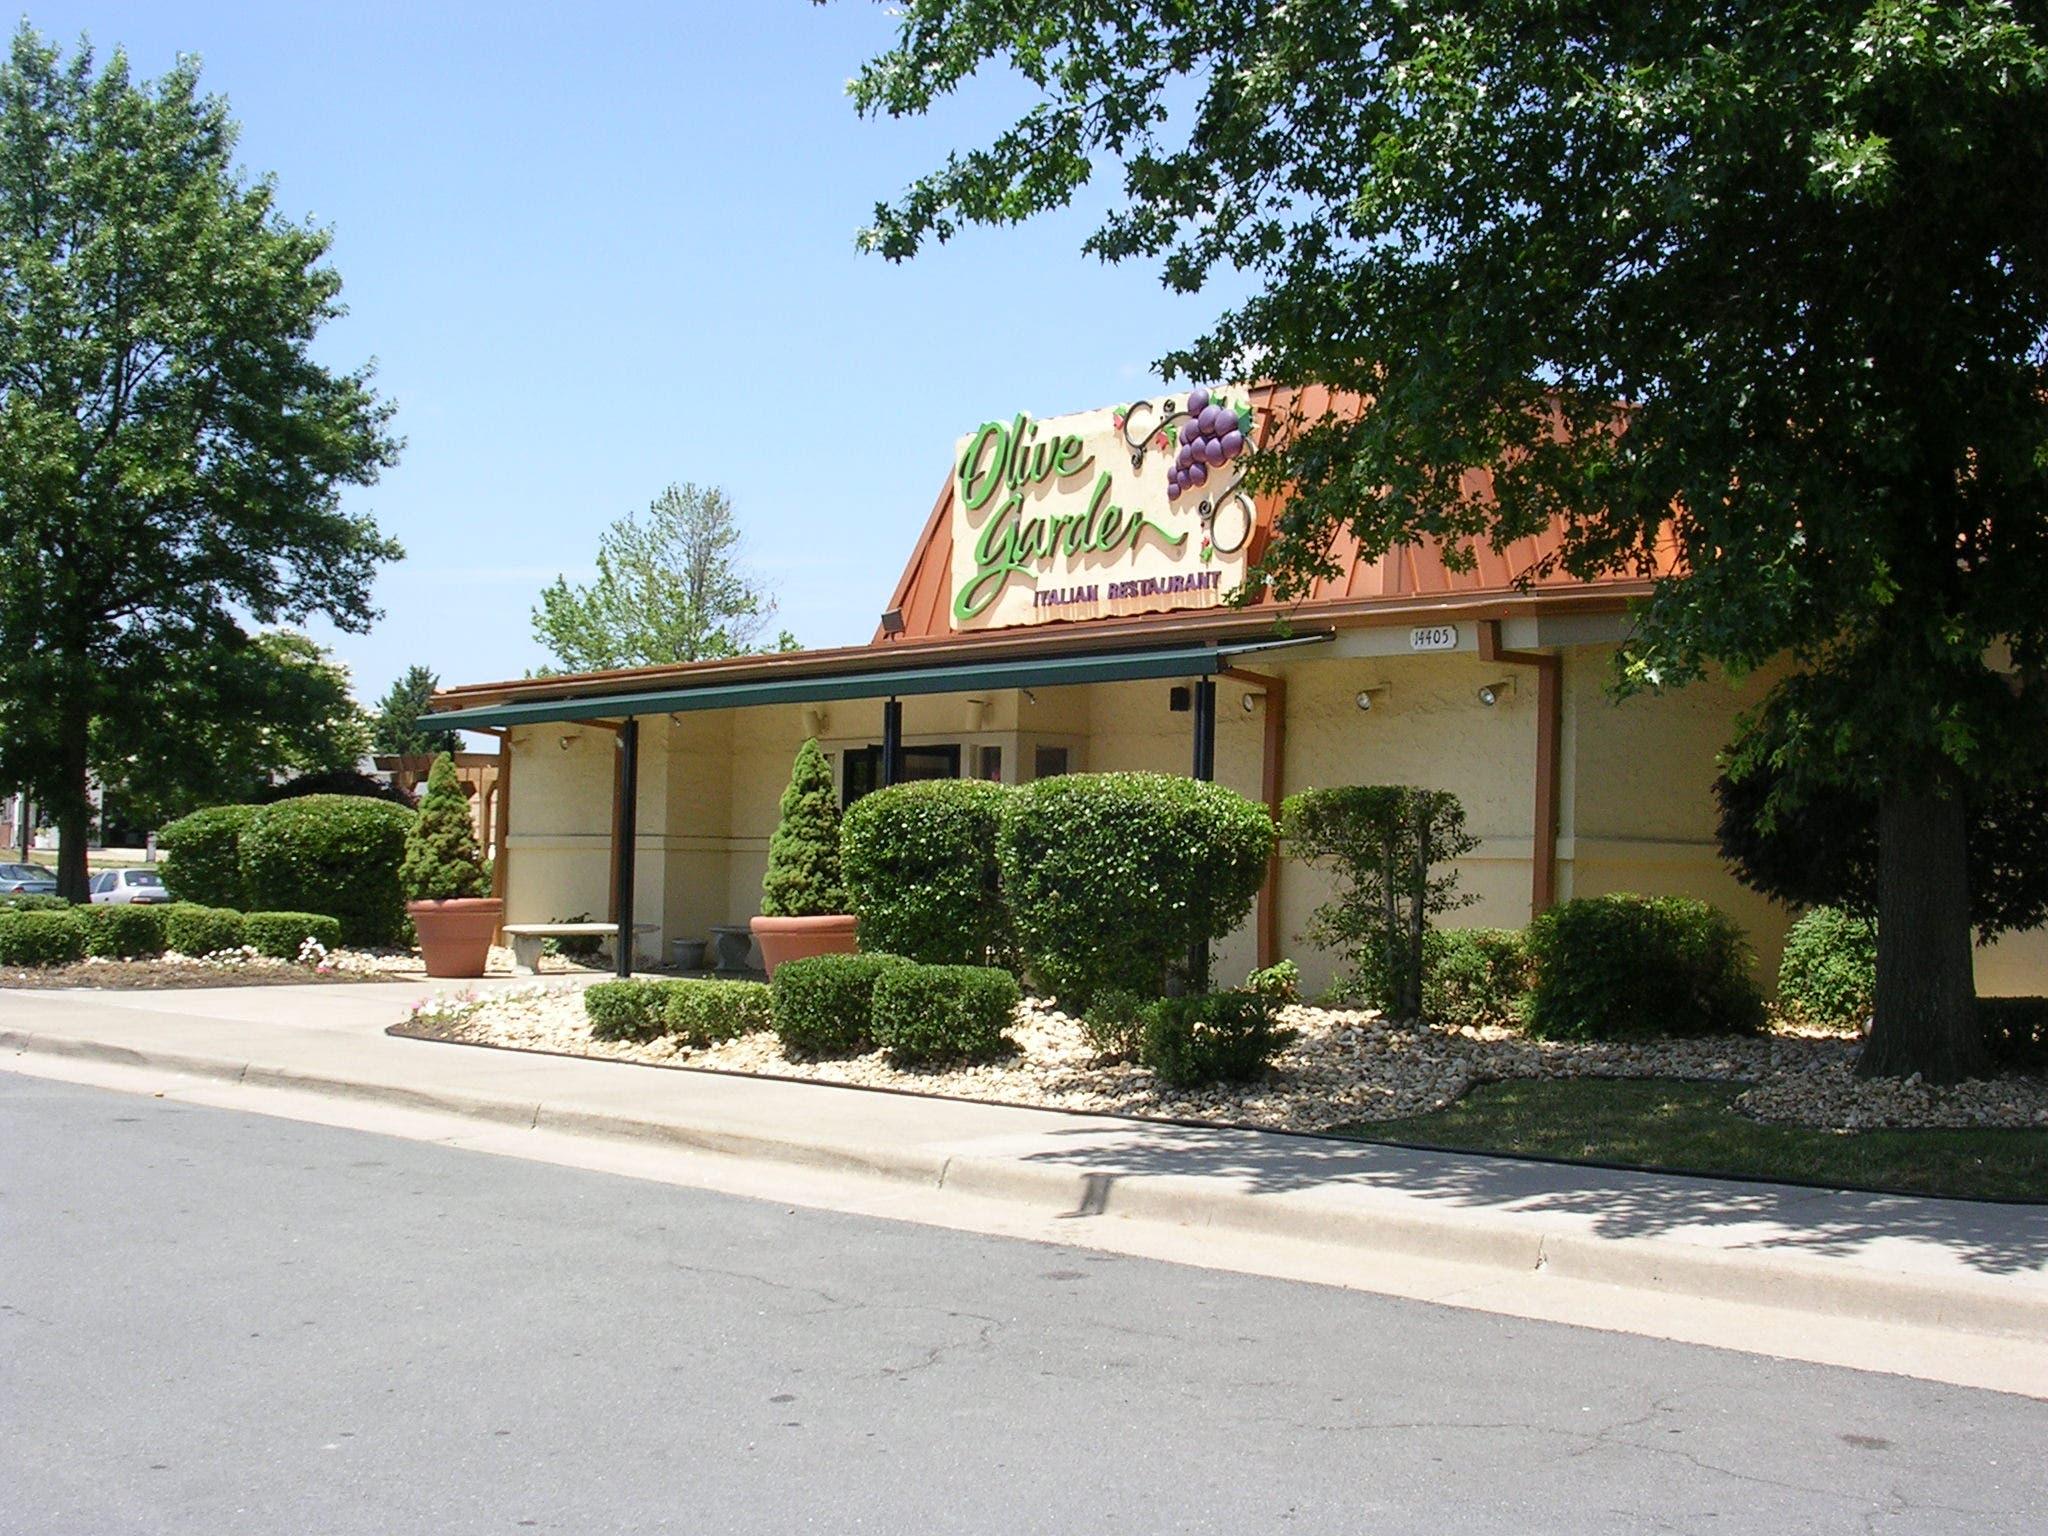 Board To Hear Plans For Olive Garden Bahama Breeze Paramus Nj